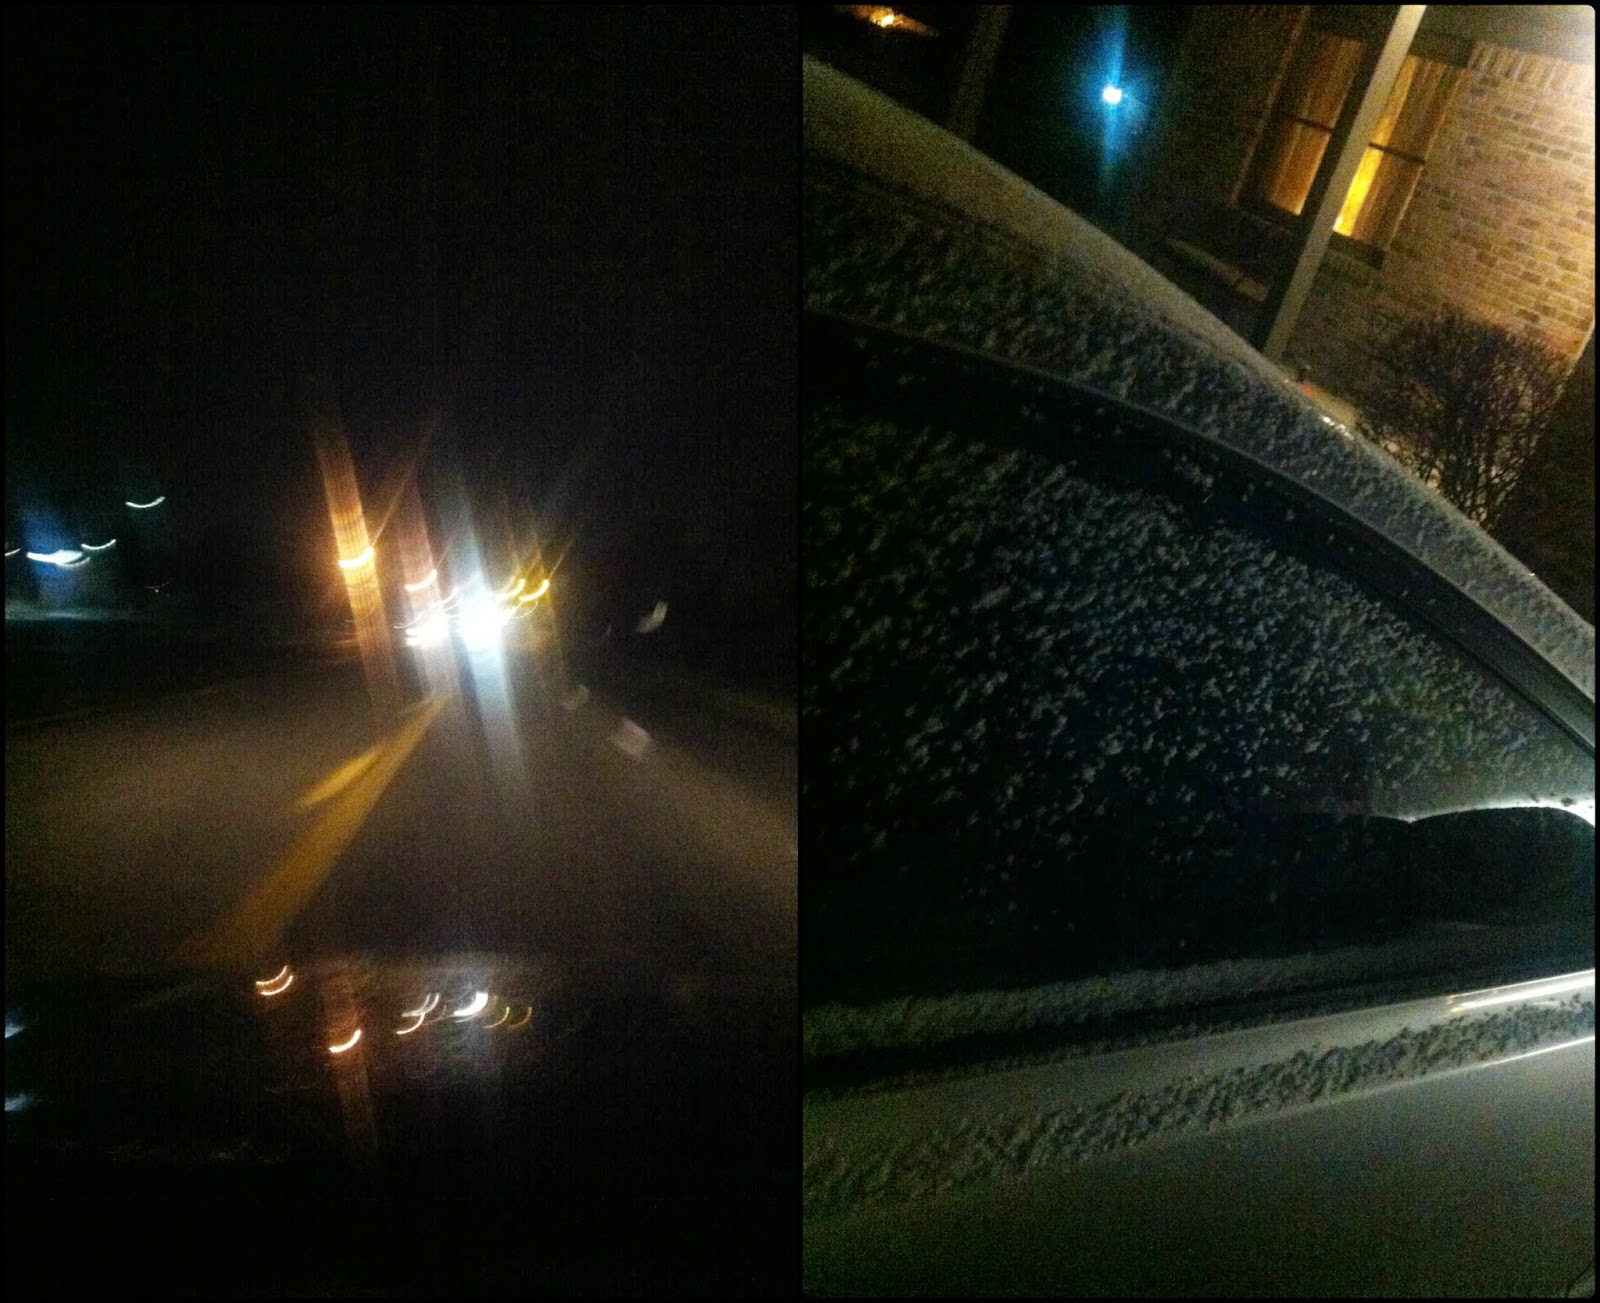 snow-flurries-on-car